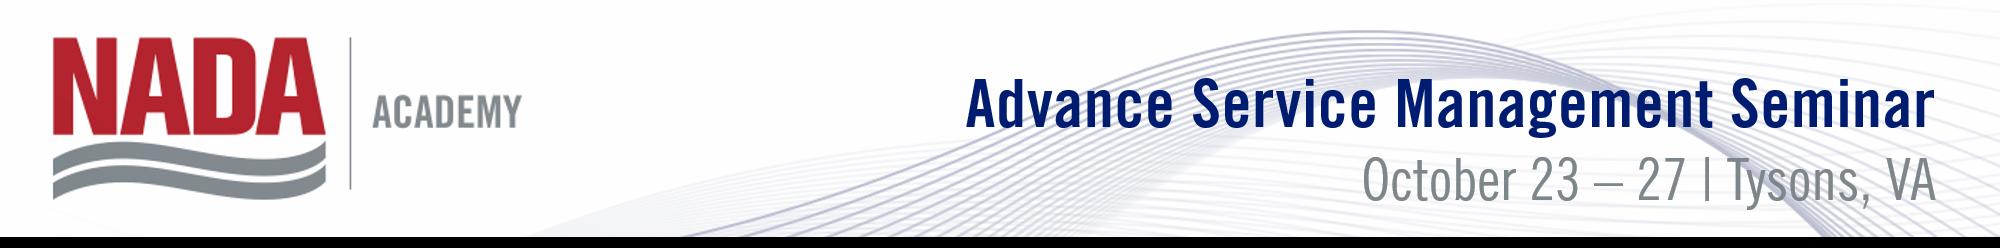 Advanced Service Management Seminar 553fd3702